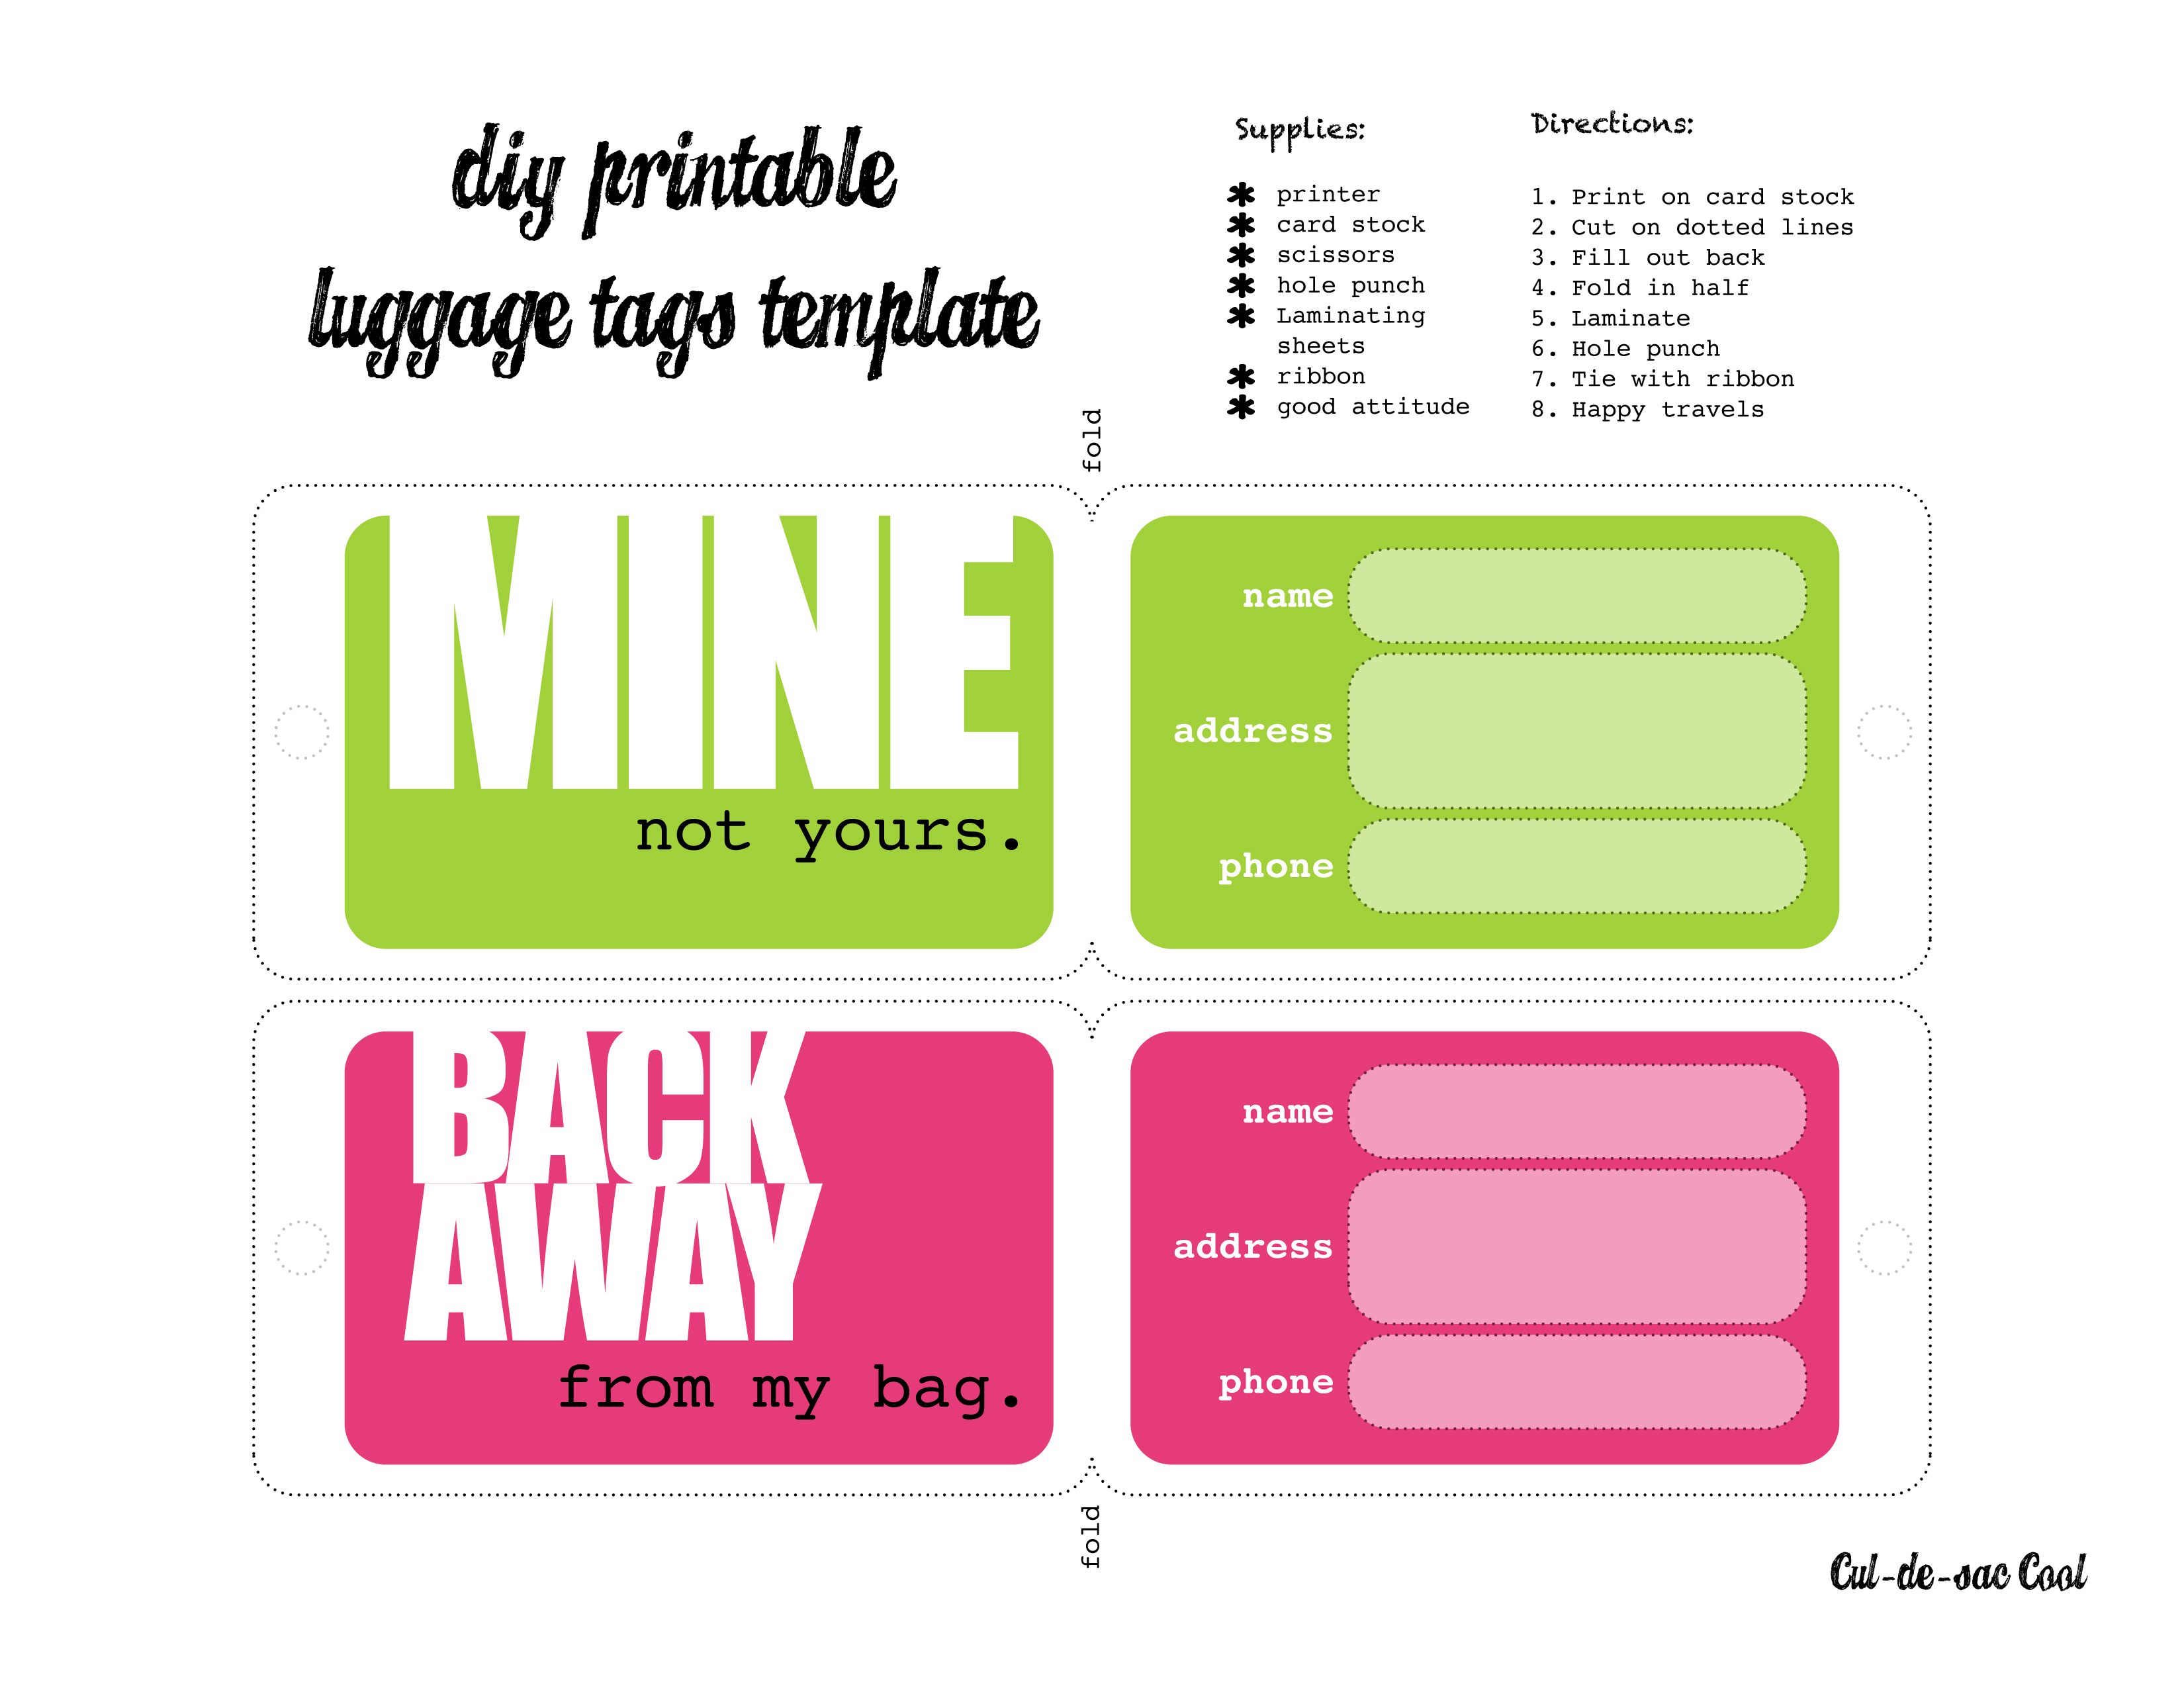 5 Images of DIY Printable Luggage Tags